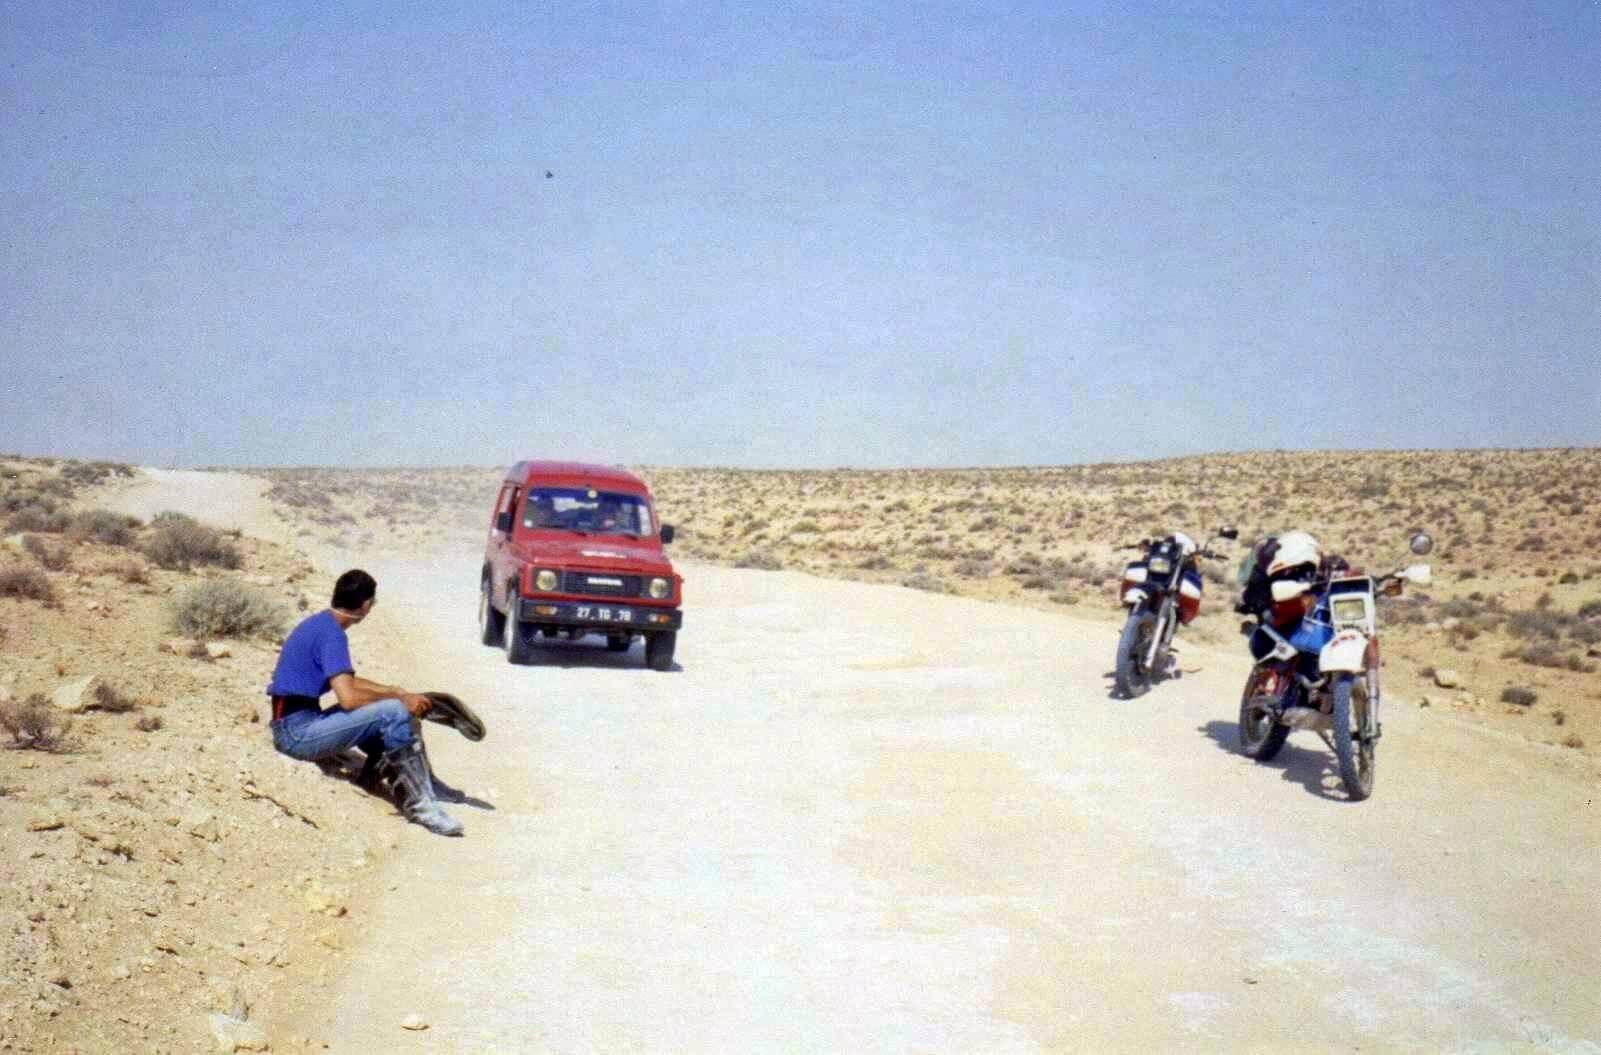 Raid moto 4x4 Tunisie Wild Spot Chebika Gafsa